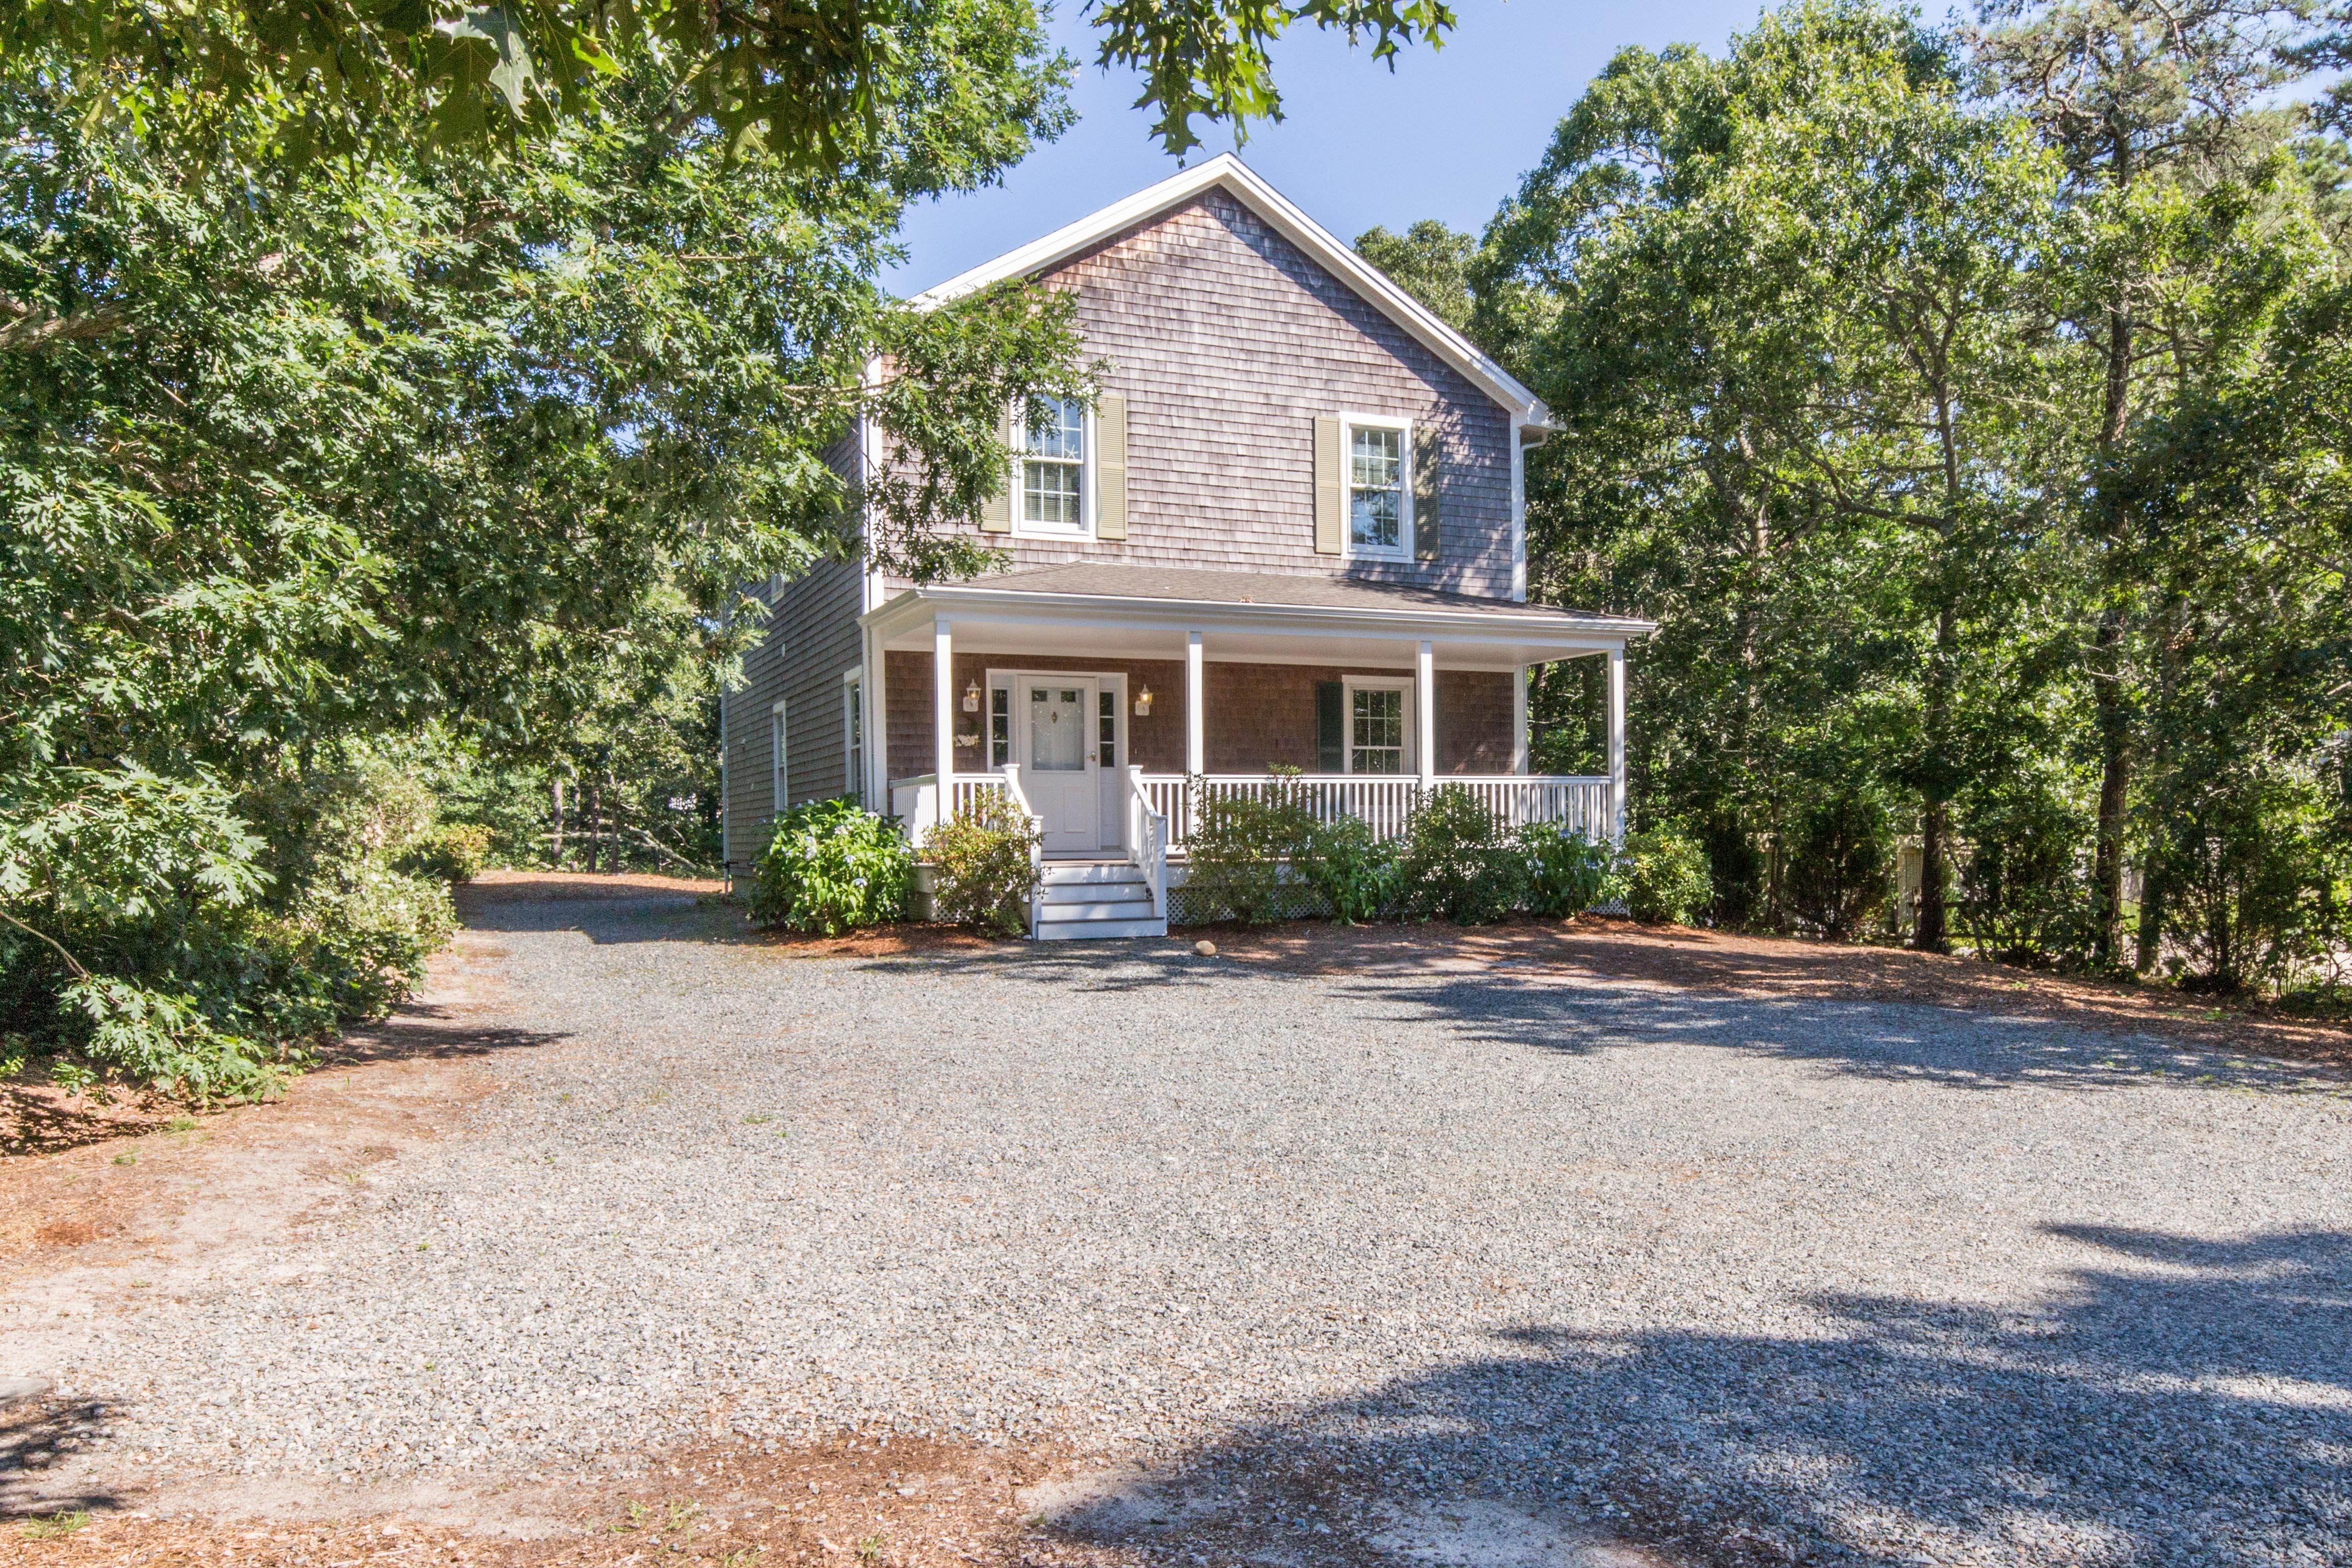 Sold Home in Martha's Vineyard